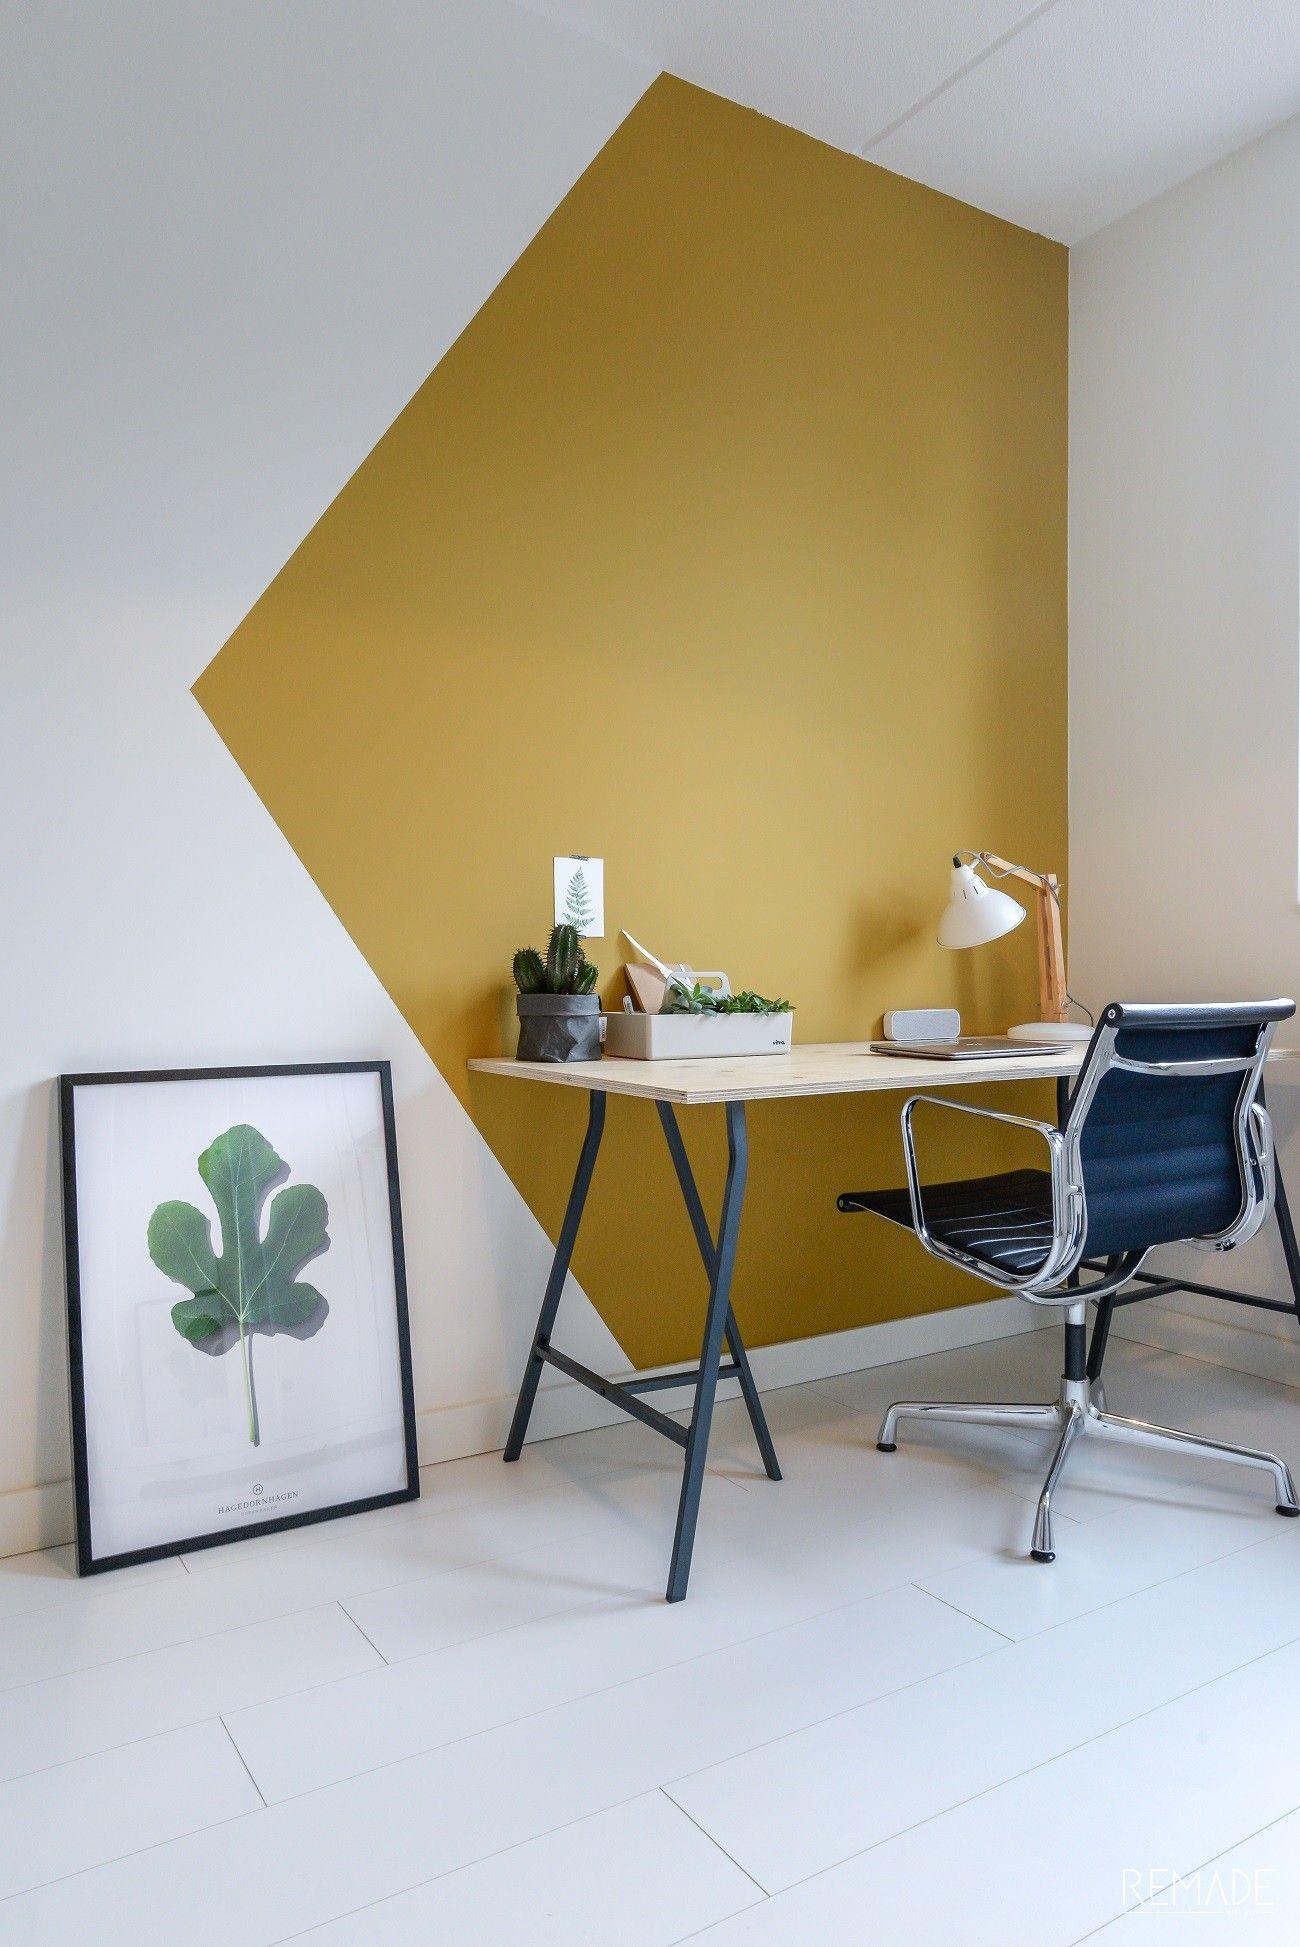 Wand inspiratie | Geometrisch vlak om werkplek af te bakenen ...